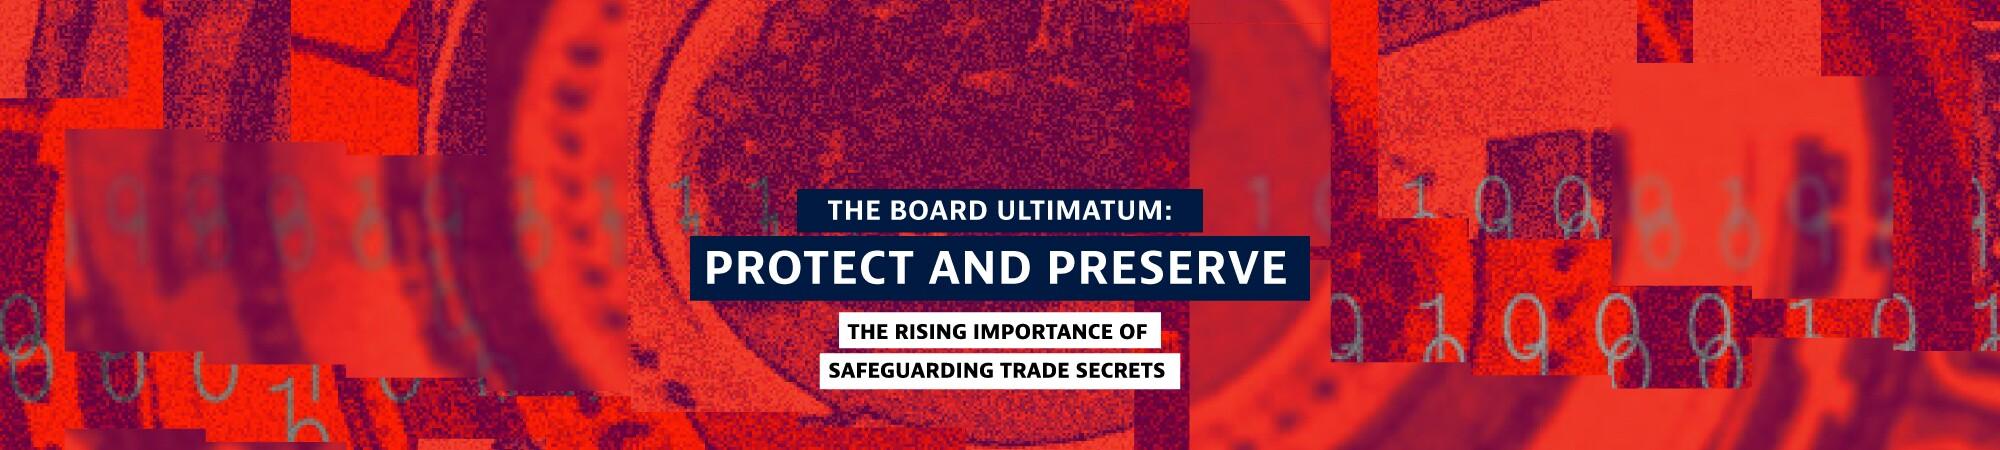 The-Board-Ultimatum-Banner1 (1).jpg